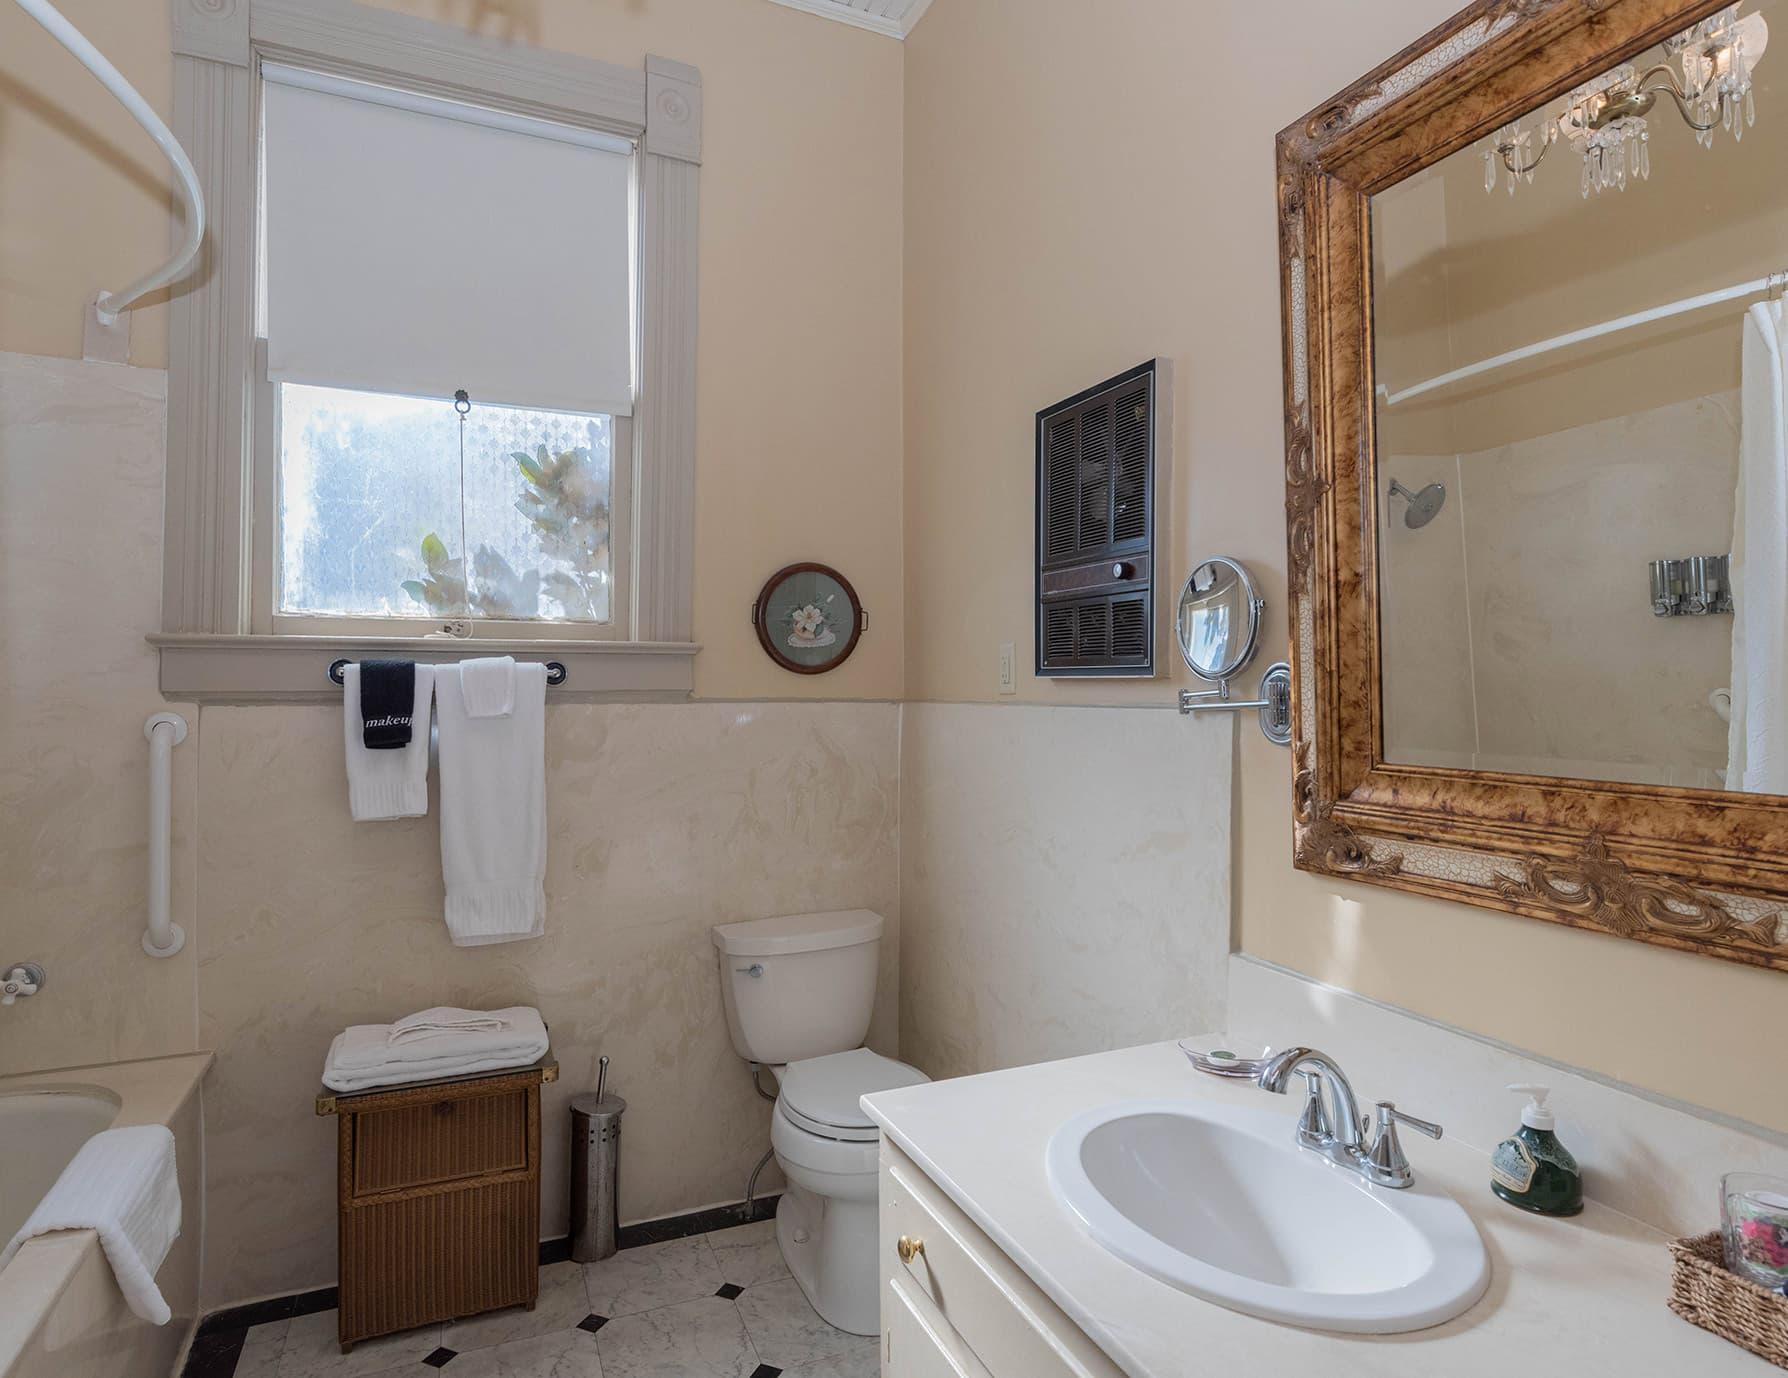 Rose Suite bathroom at our Natchez B&B